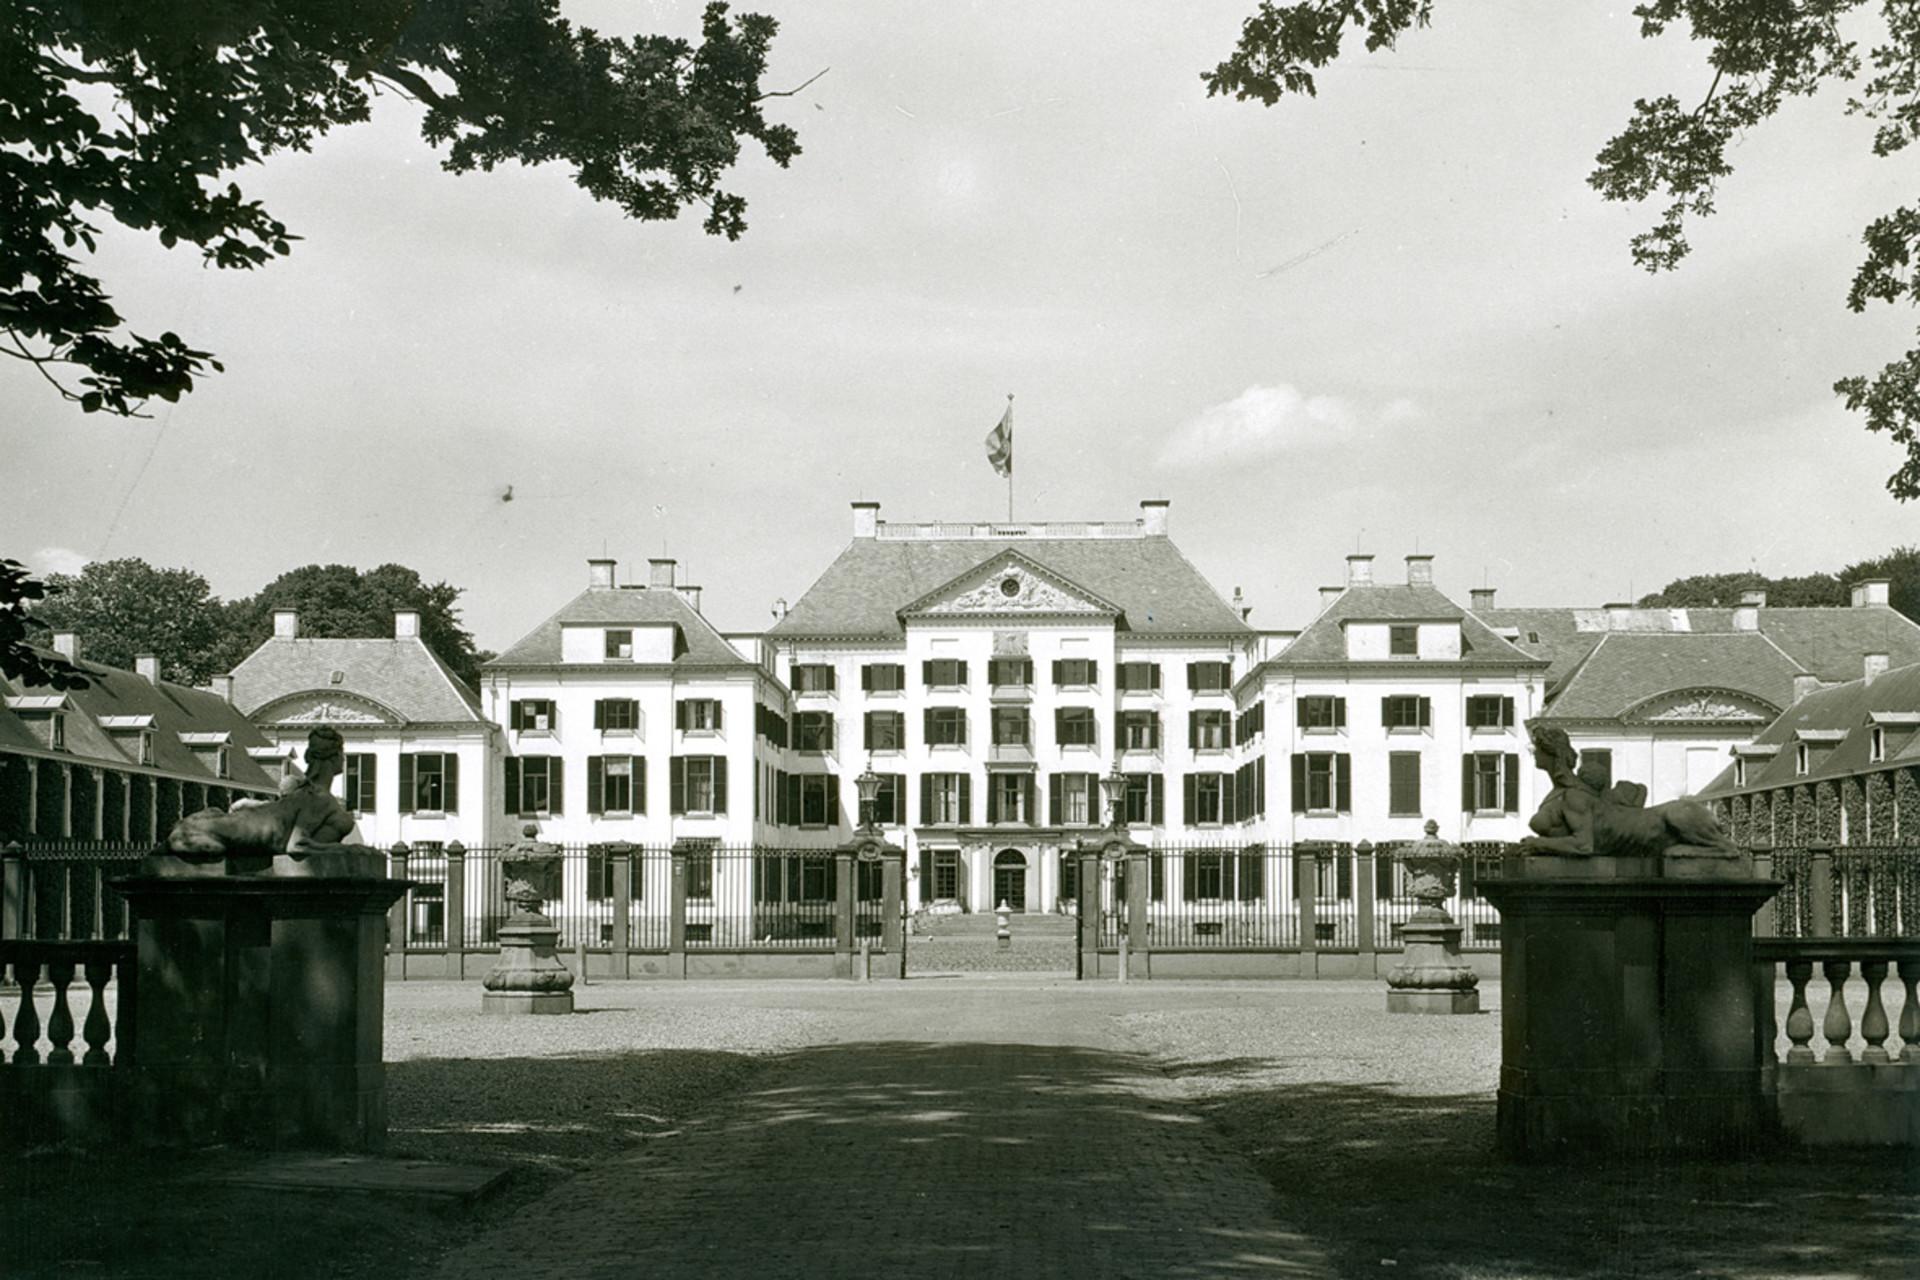 Palast Het Loo